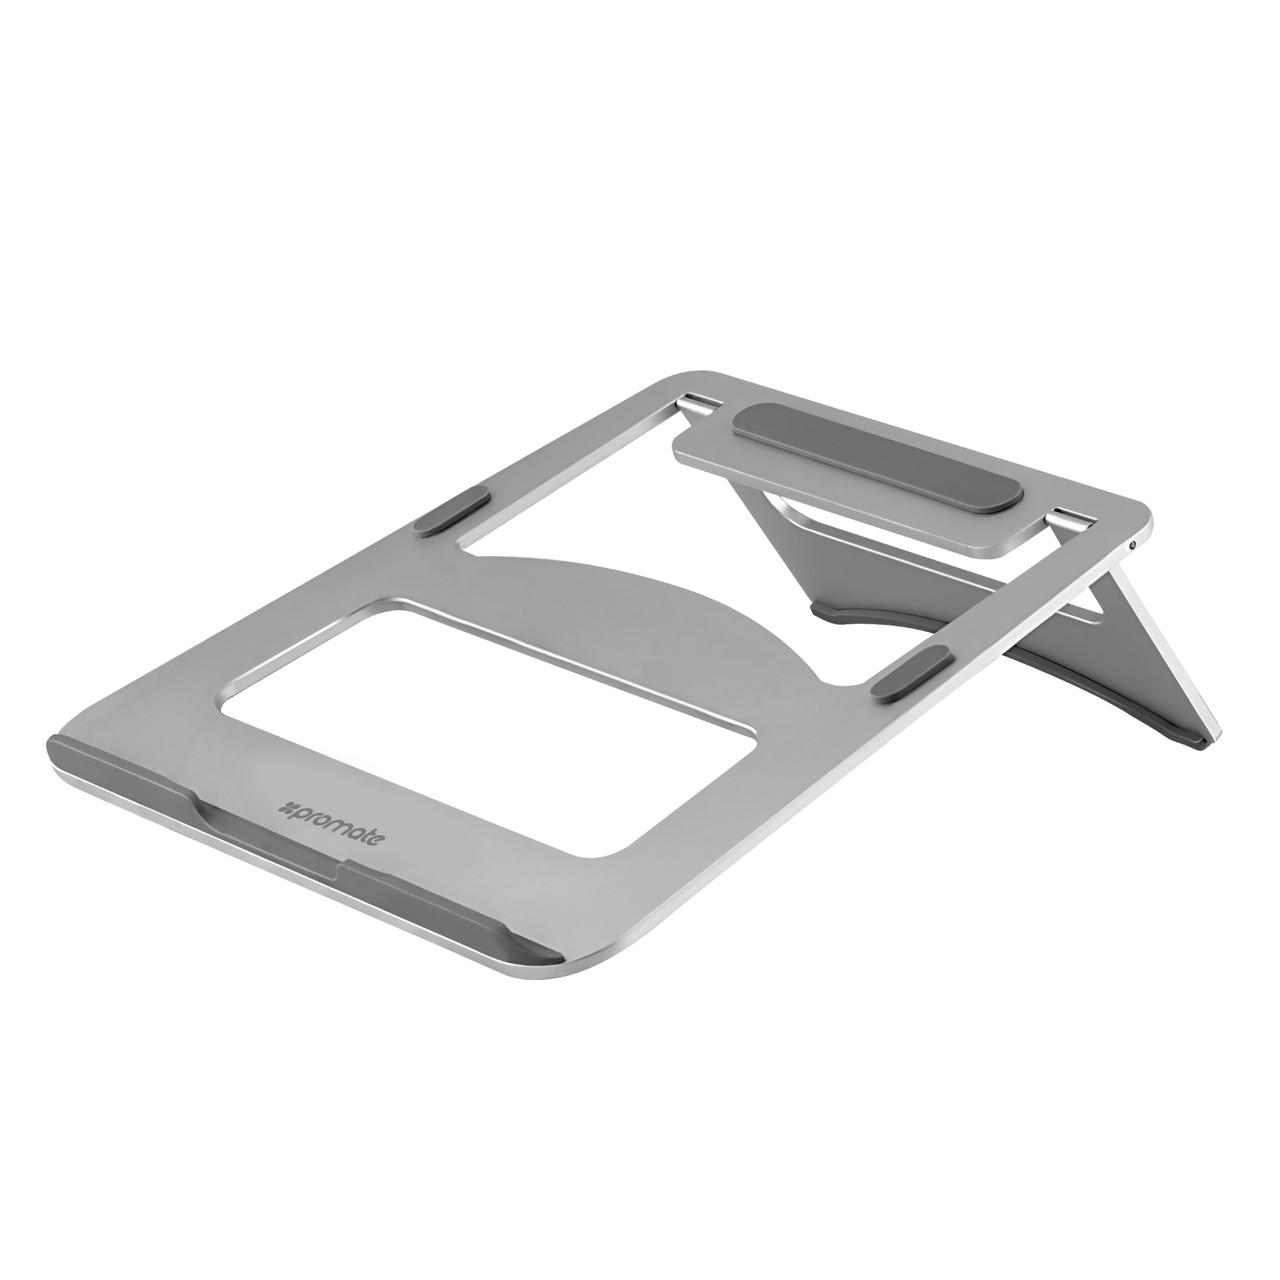 Подставка под ноутбук Promate Deskmate-3 Silver